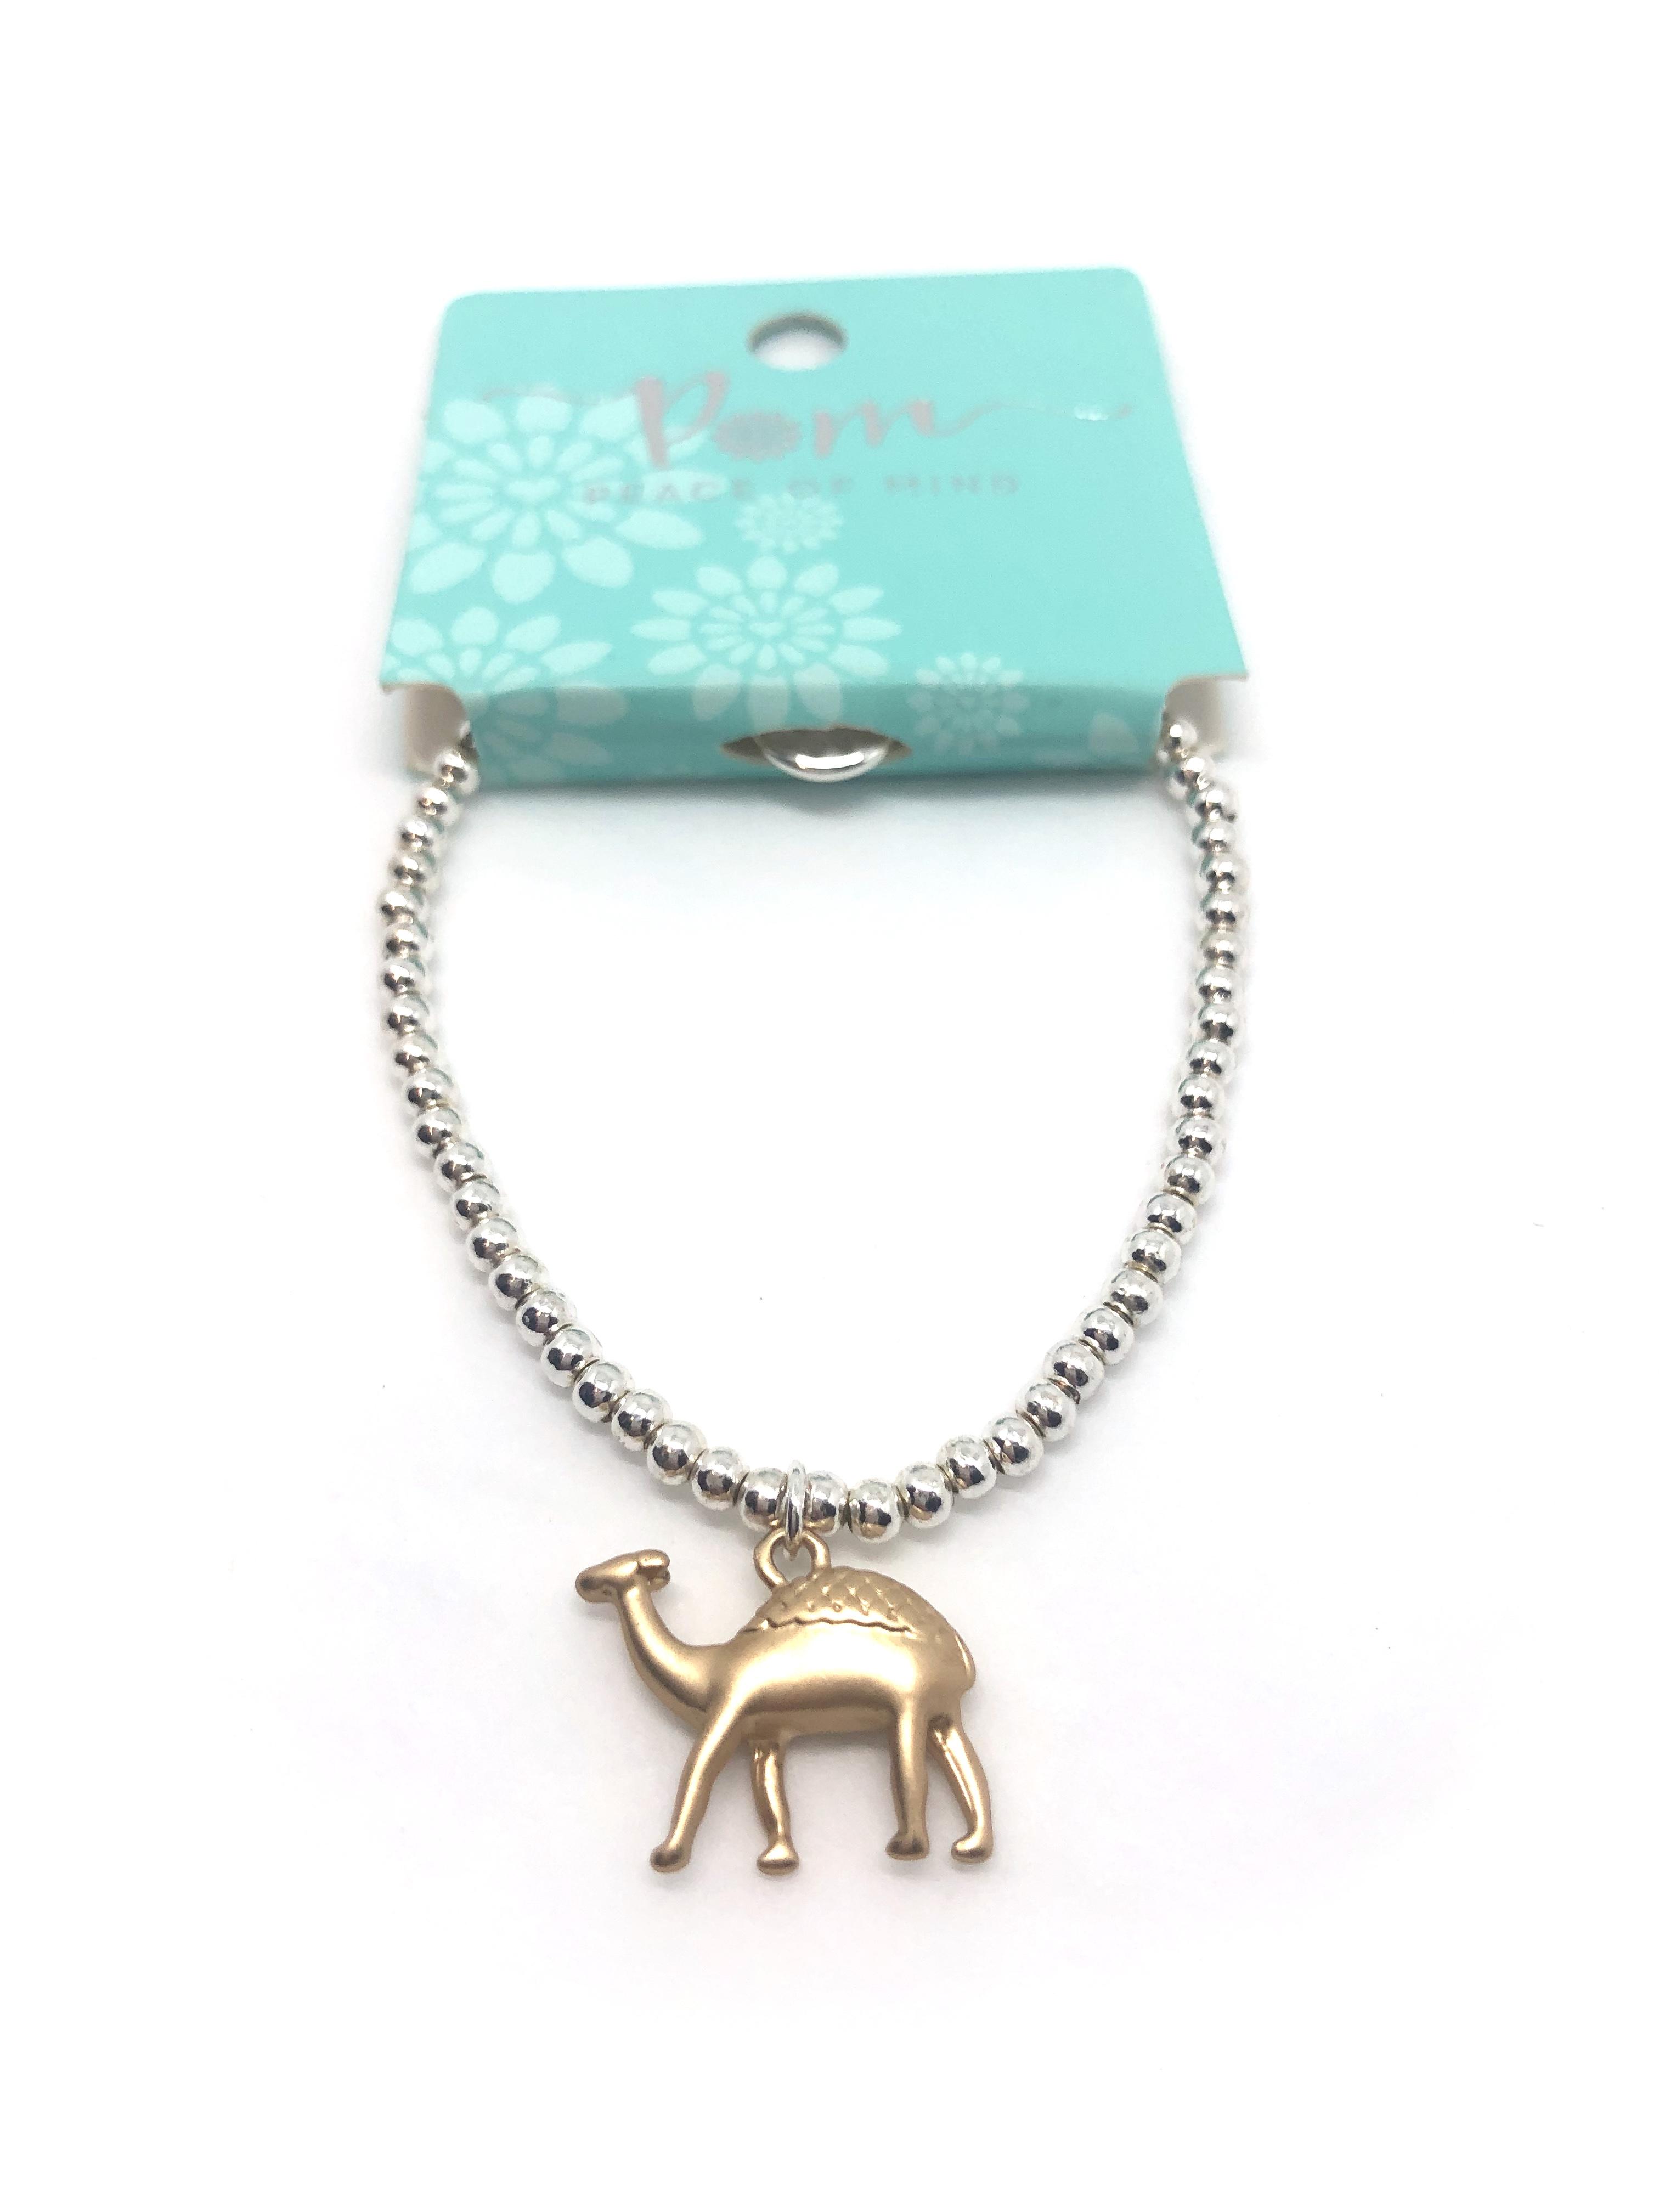 Bracelet (Pom) Silver With Gold Camel Charm